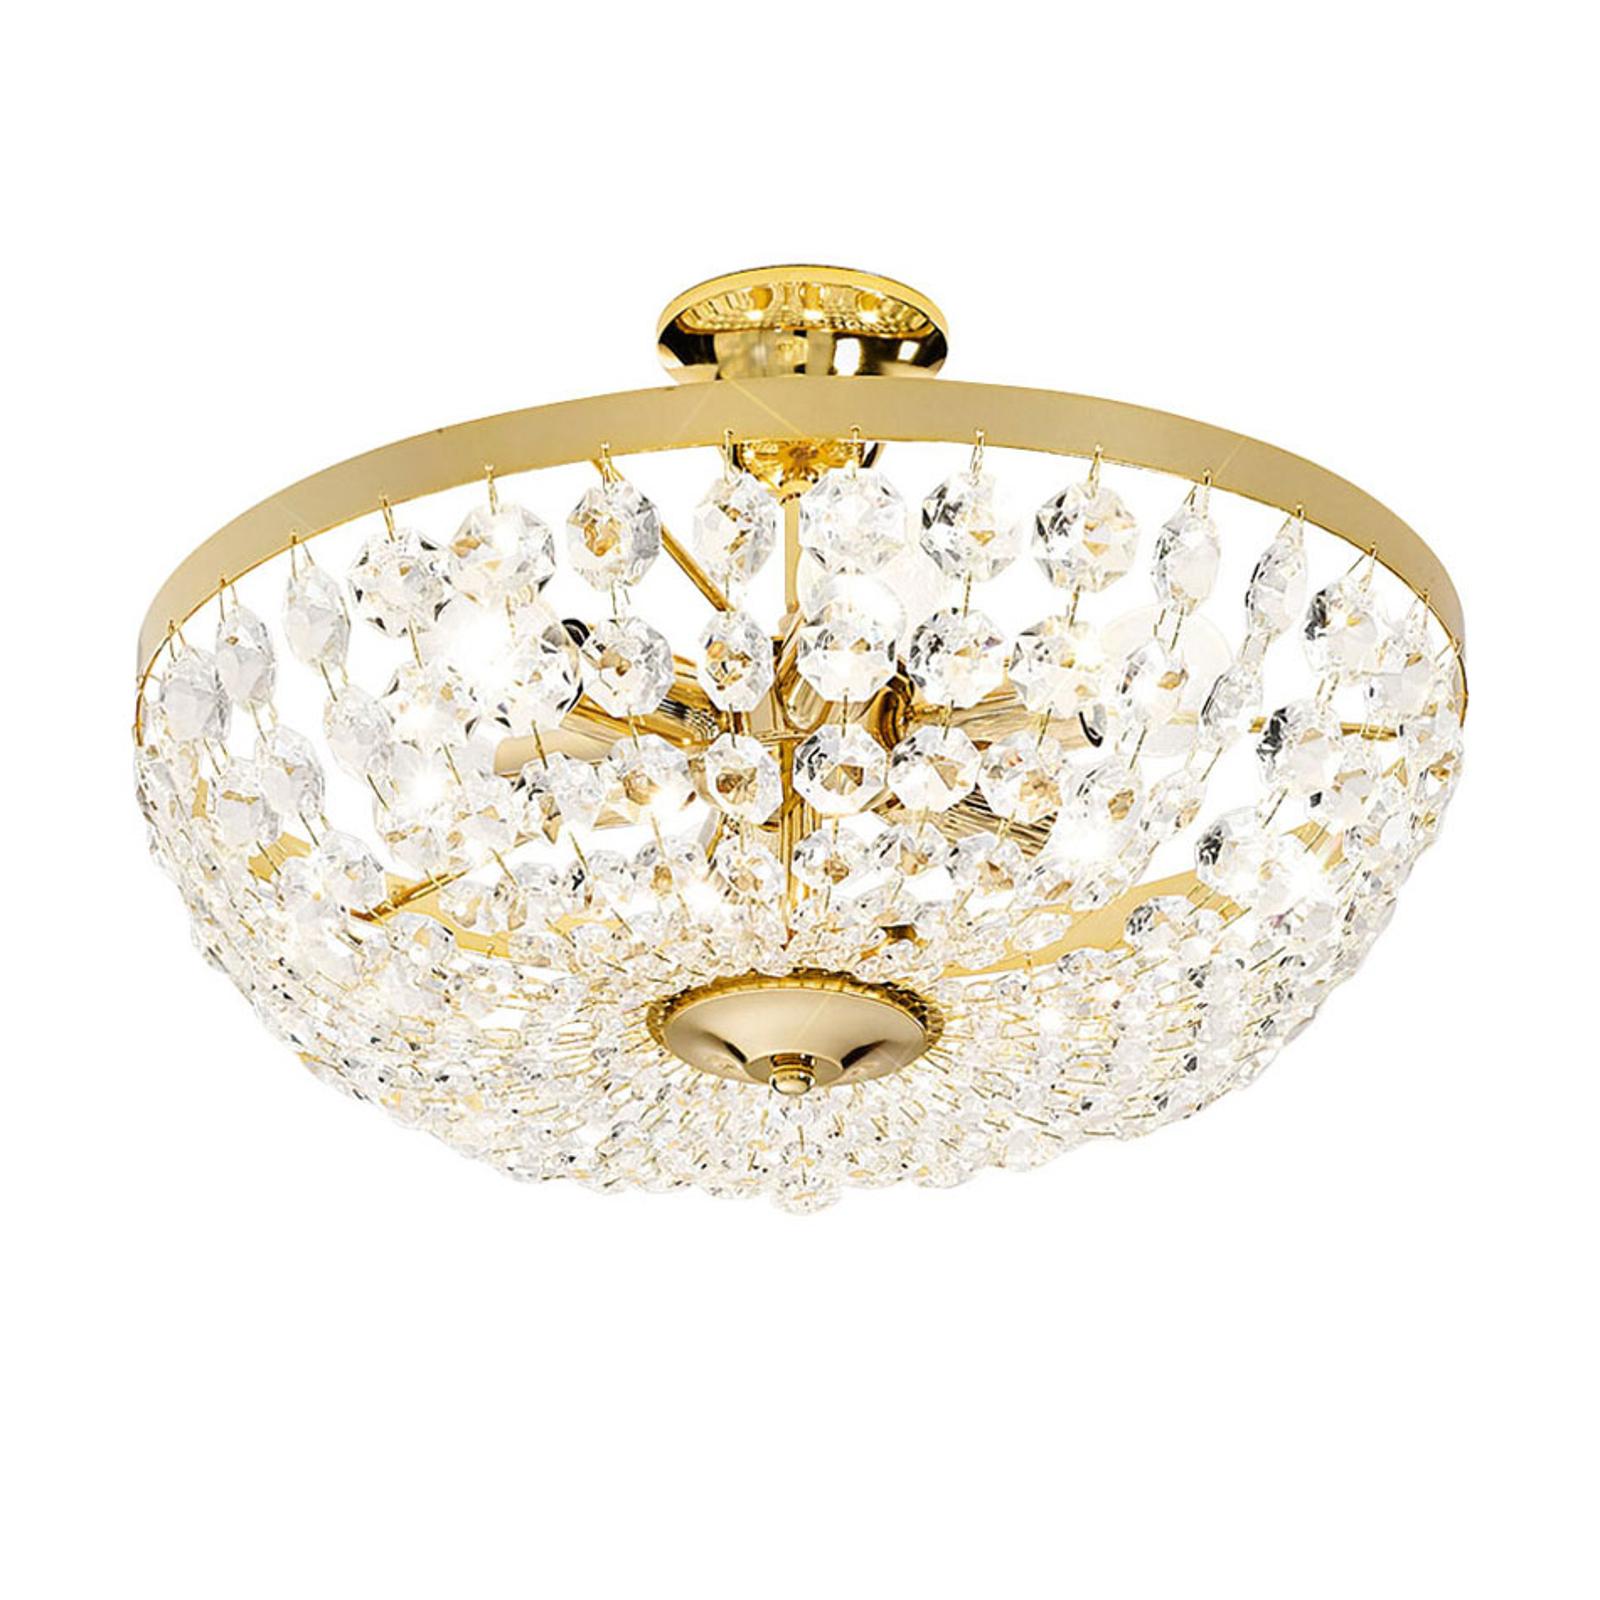 Plafondlamp Valerie met kristallen Ø 40 cm